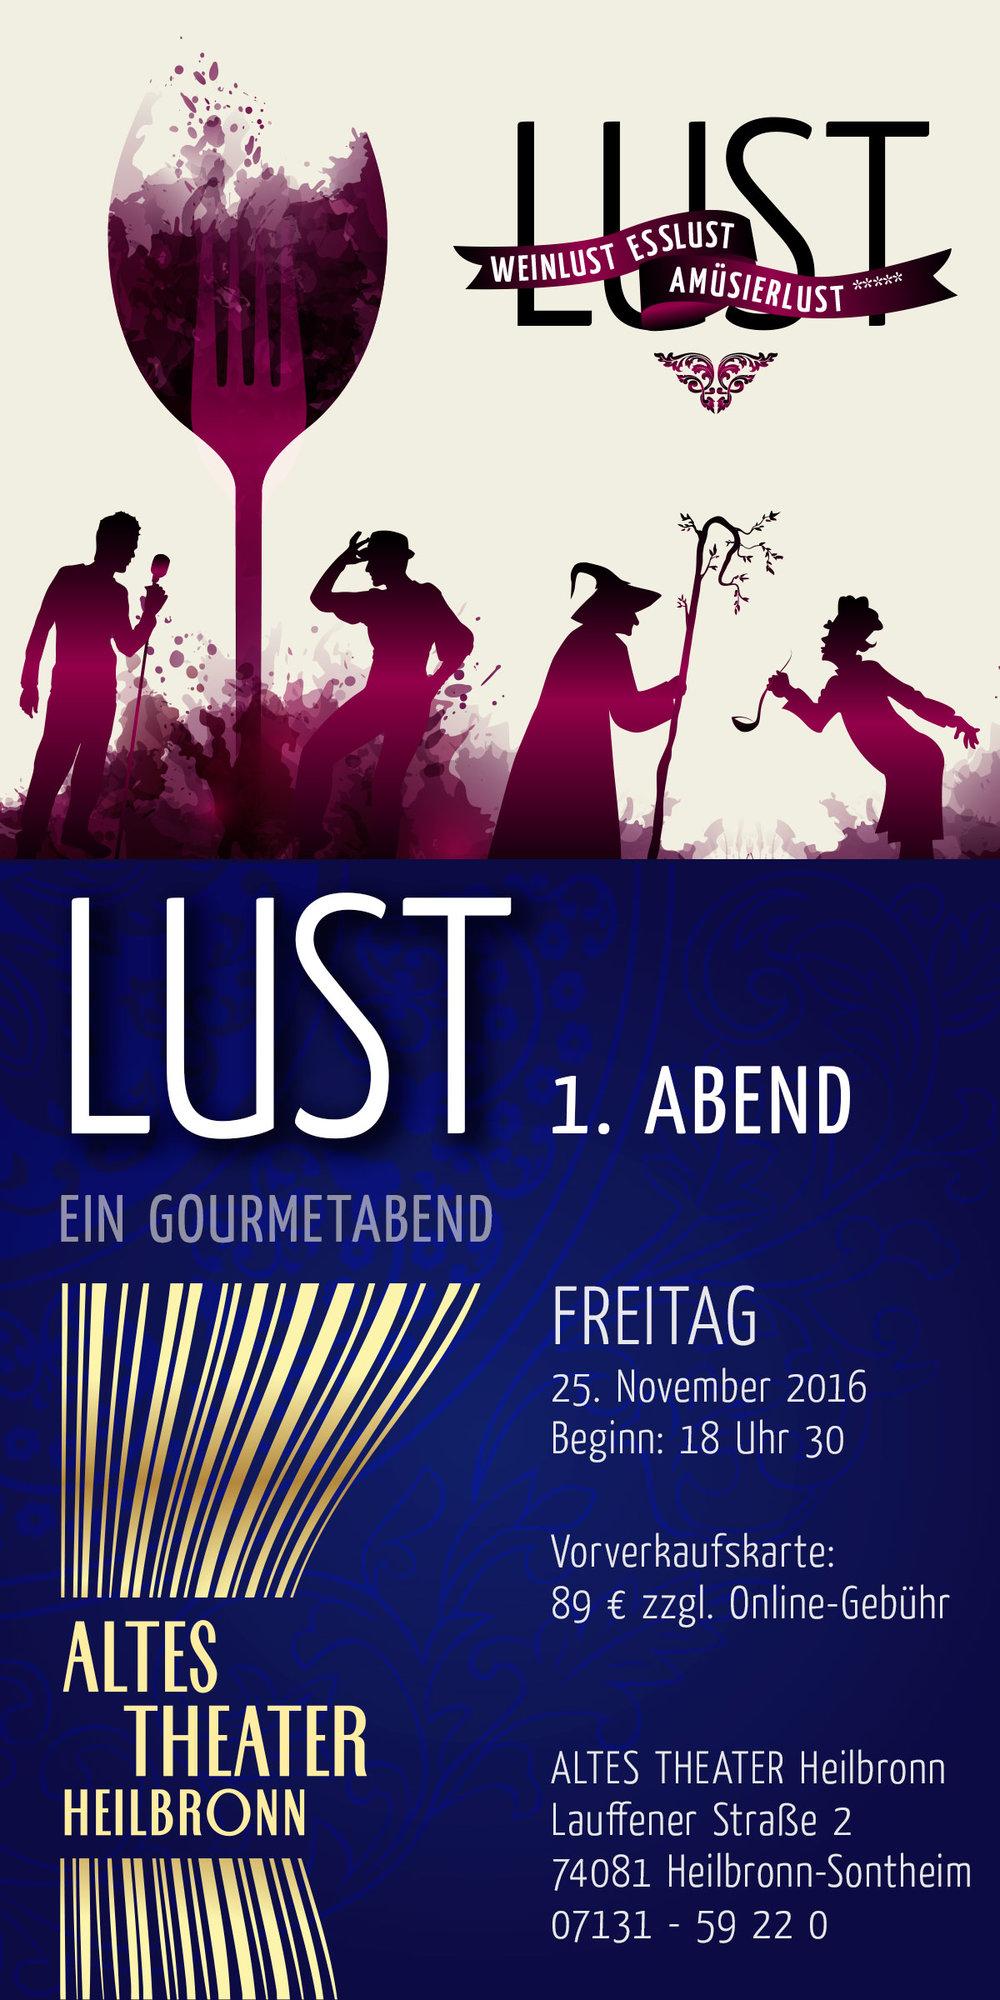 LUST-Gourmetabend-ALTES-THEATER-Heilbronn